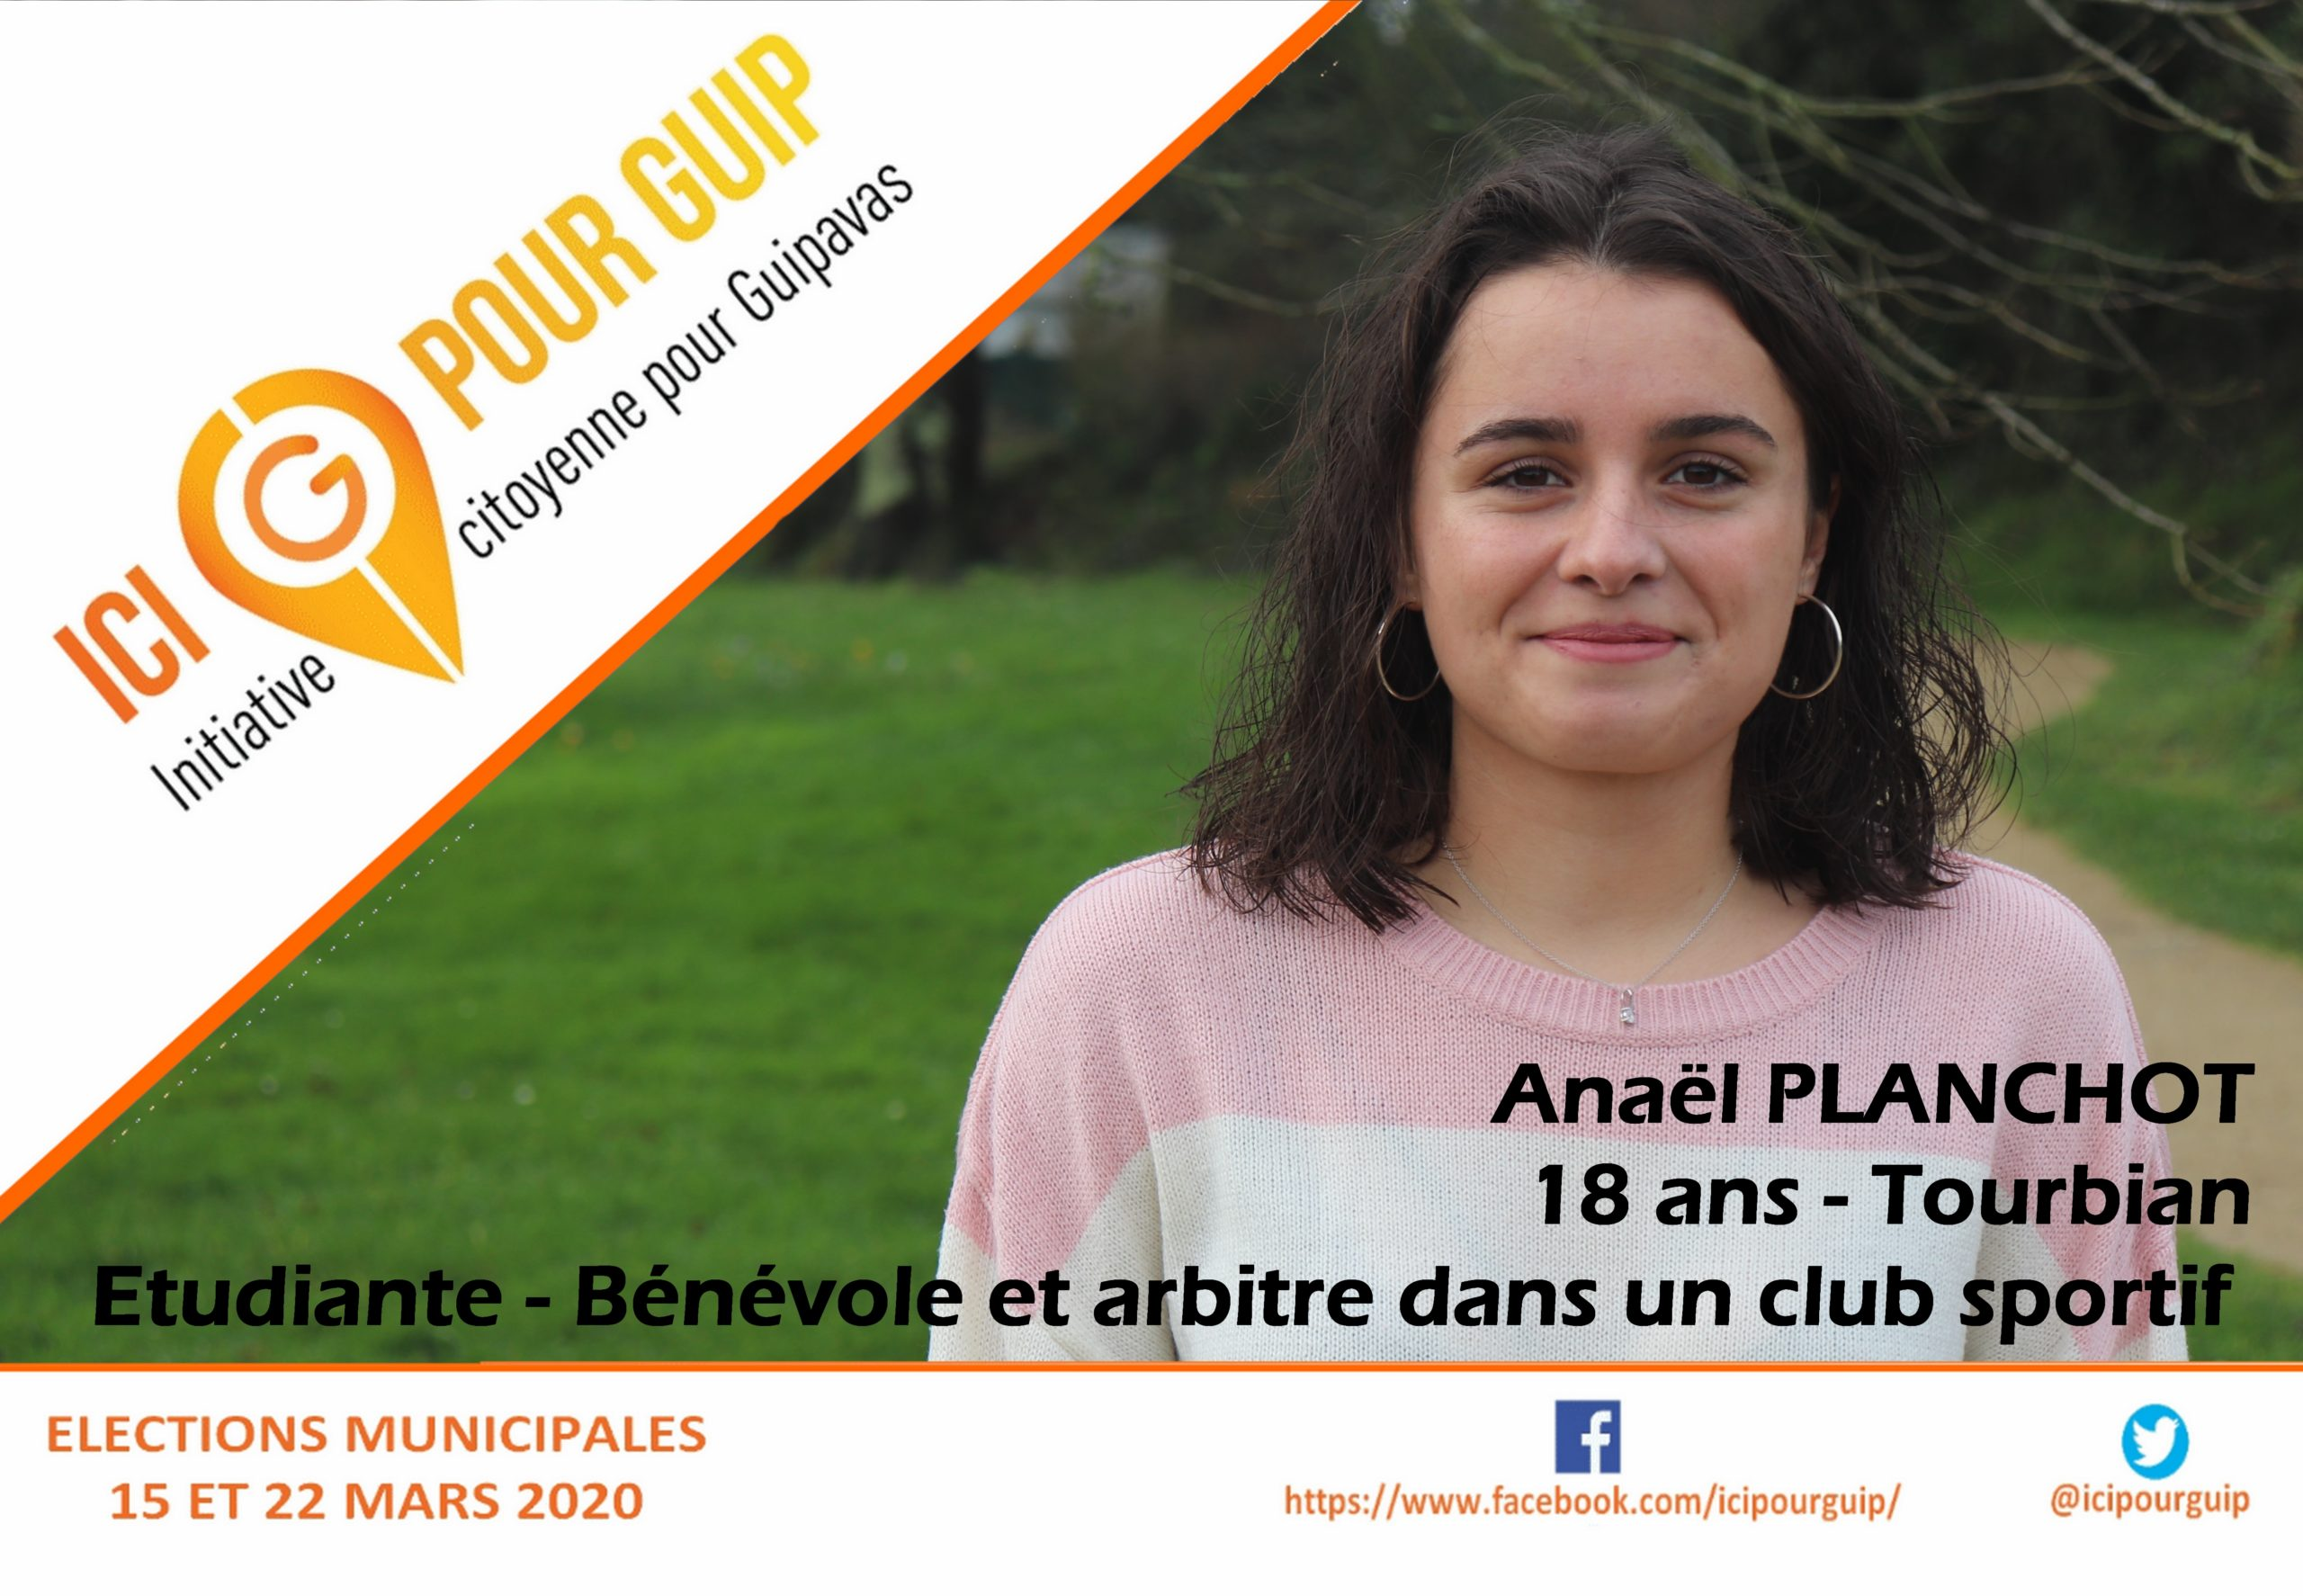 Anaël Planchot